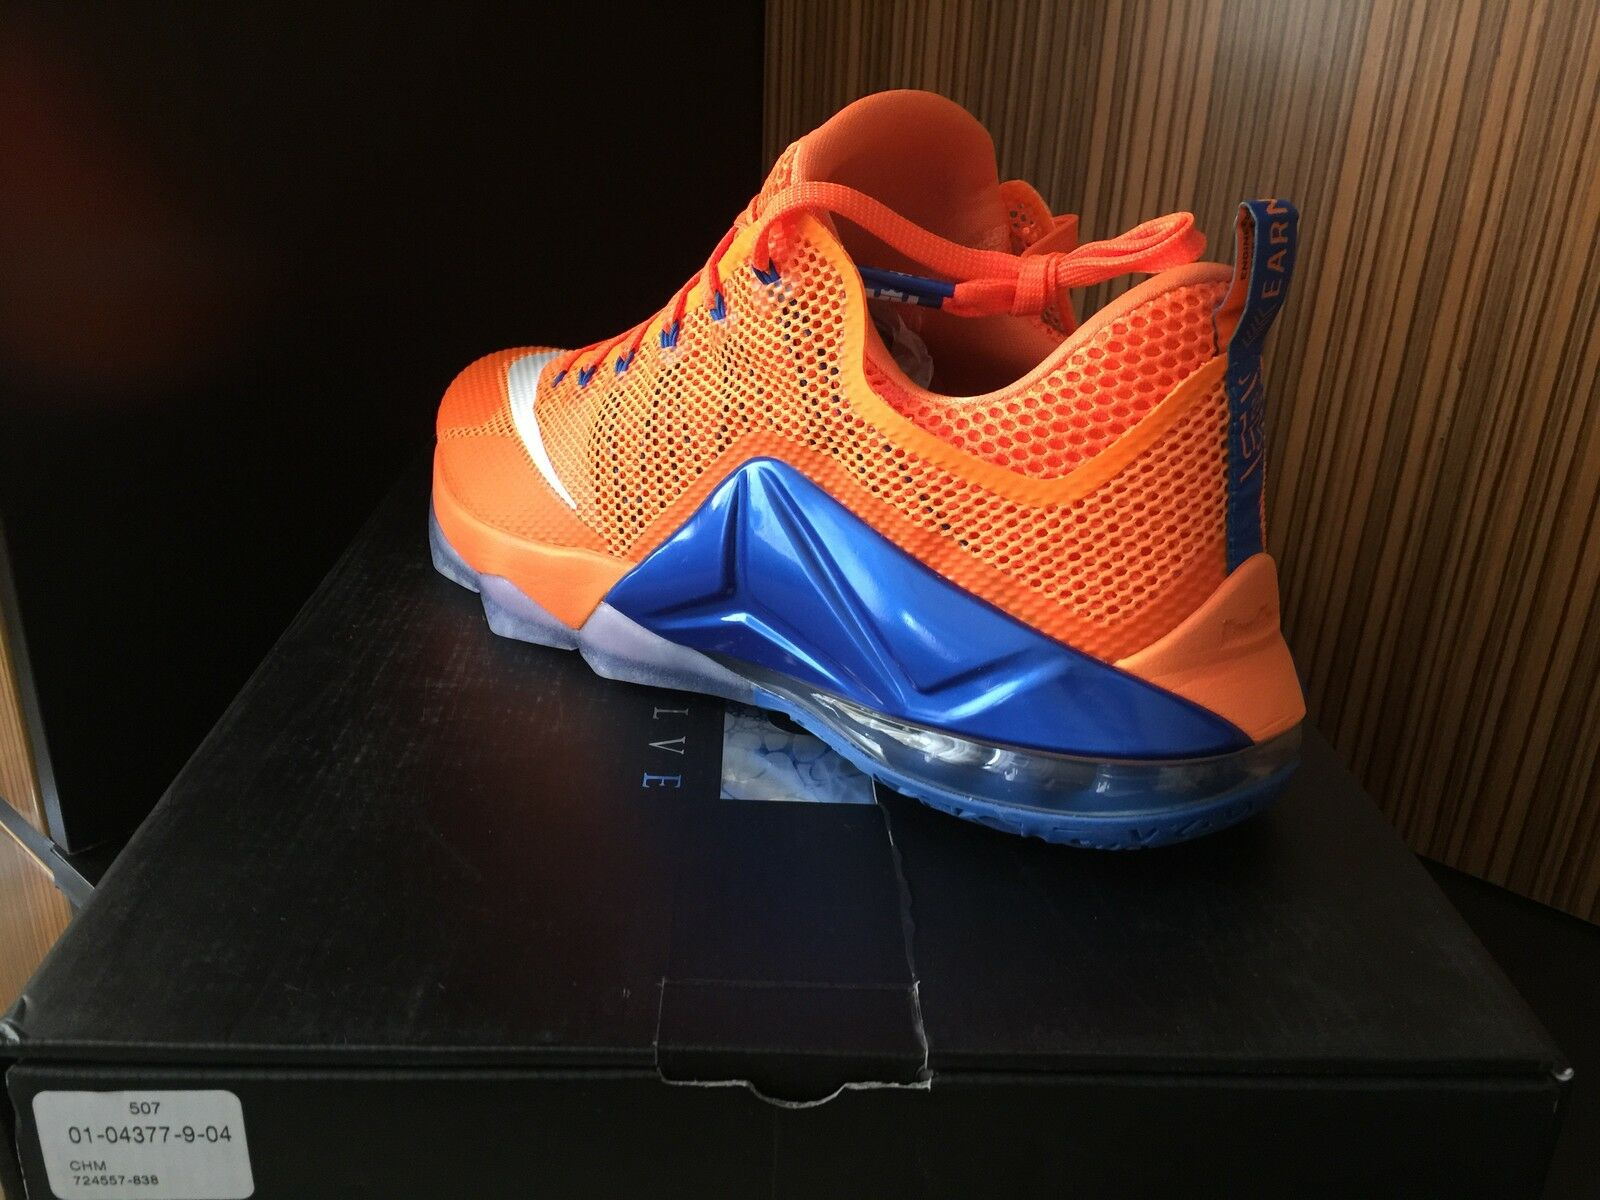 Nike AIR LEBRON XII 13 - 8 Elite New York Knicks Gators Orange Blue Red 12 11 10